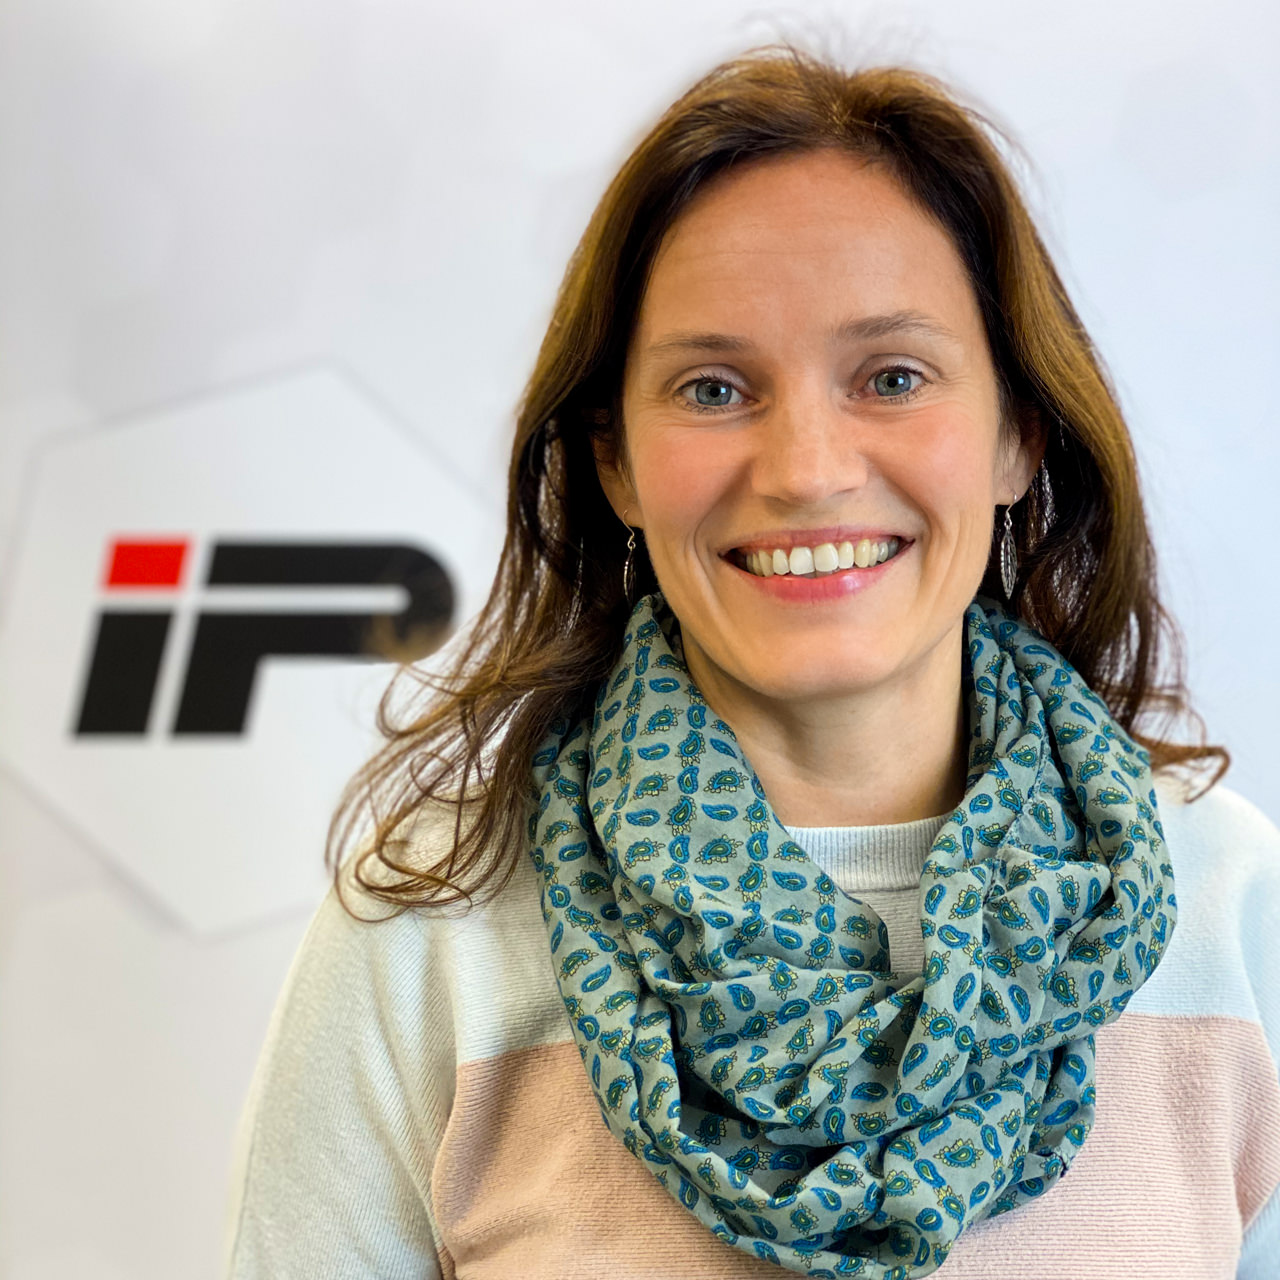 Wir begrüßen Karola Ledeboer bei IP